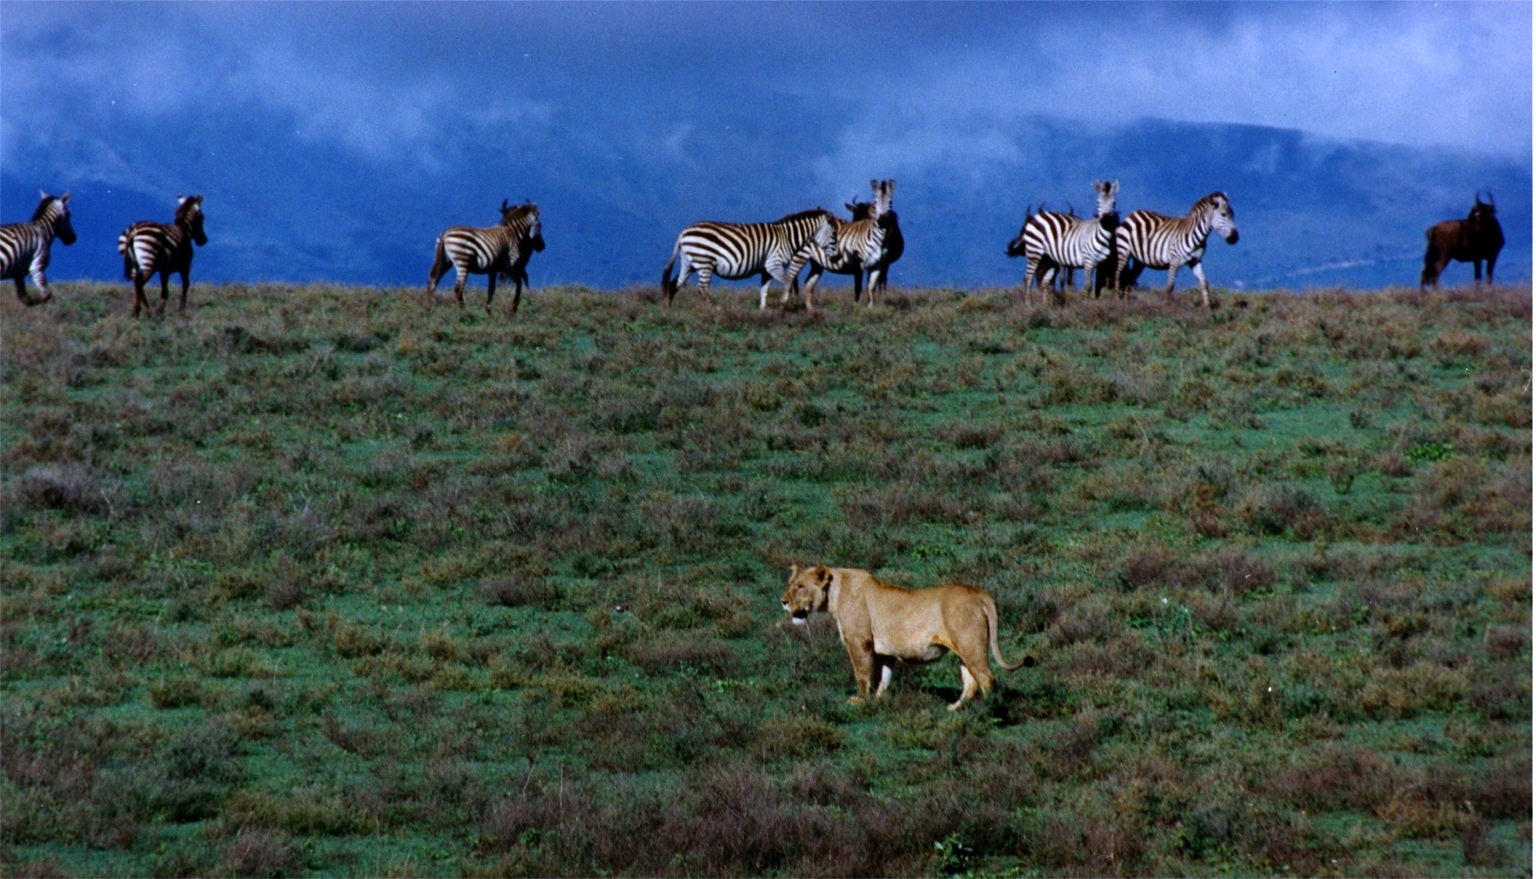 File:Lioness zebras an...